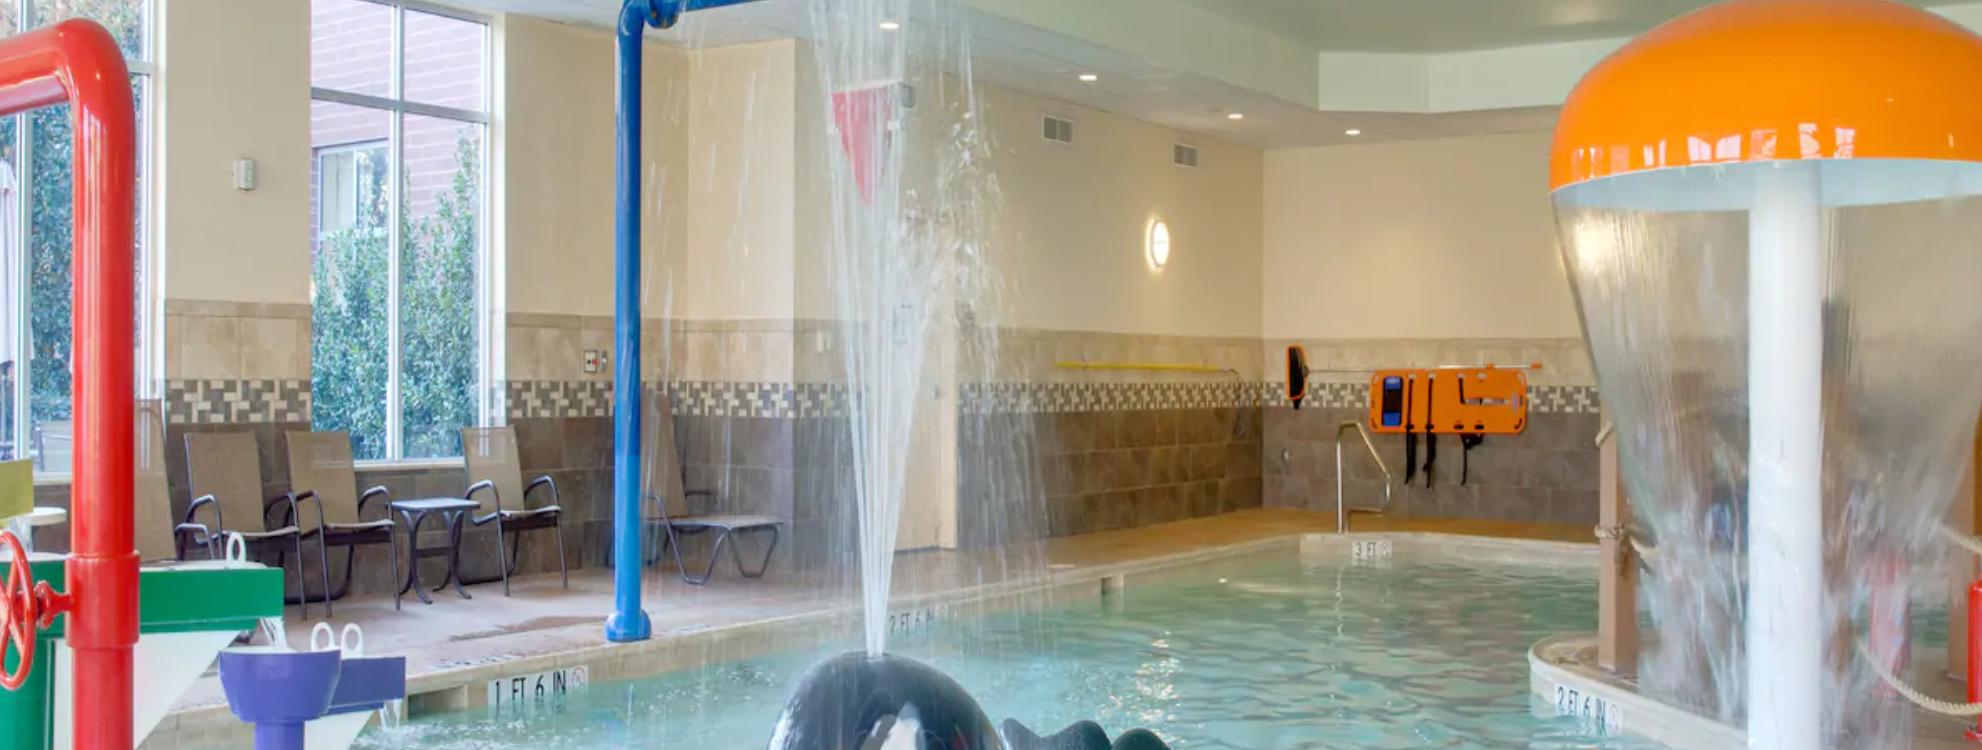 https://www.hotelsbyday.com/_data/default-hotel_image/4/23339/screenshot-2020-10-30-at-5-03-00-pm.png